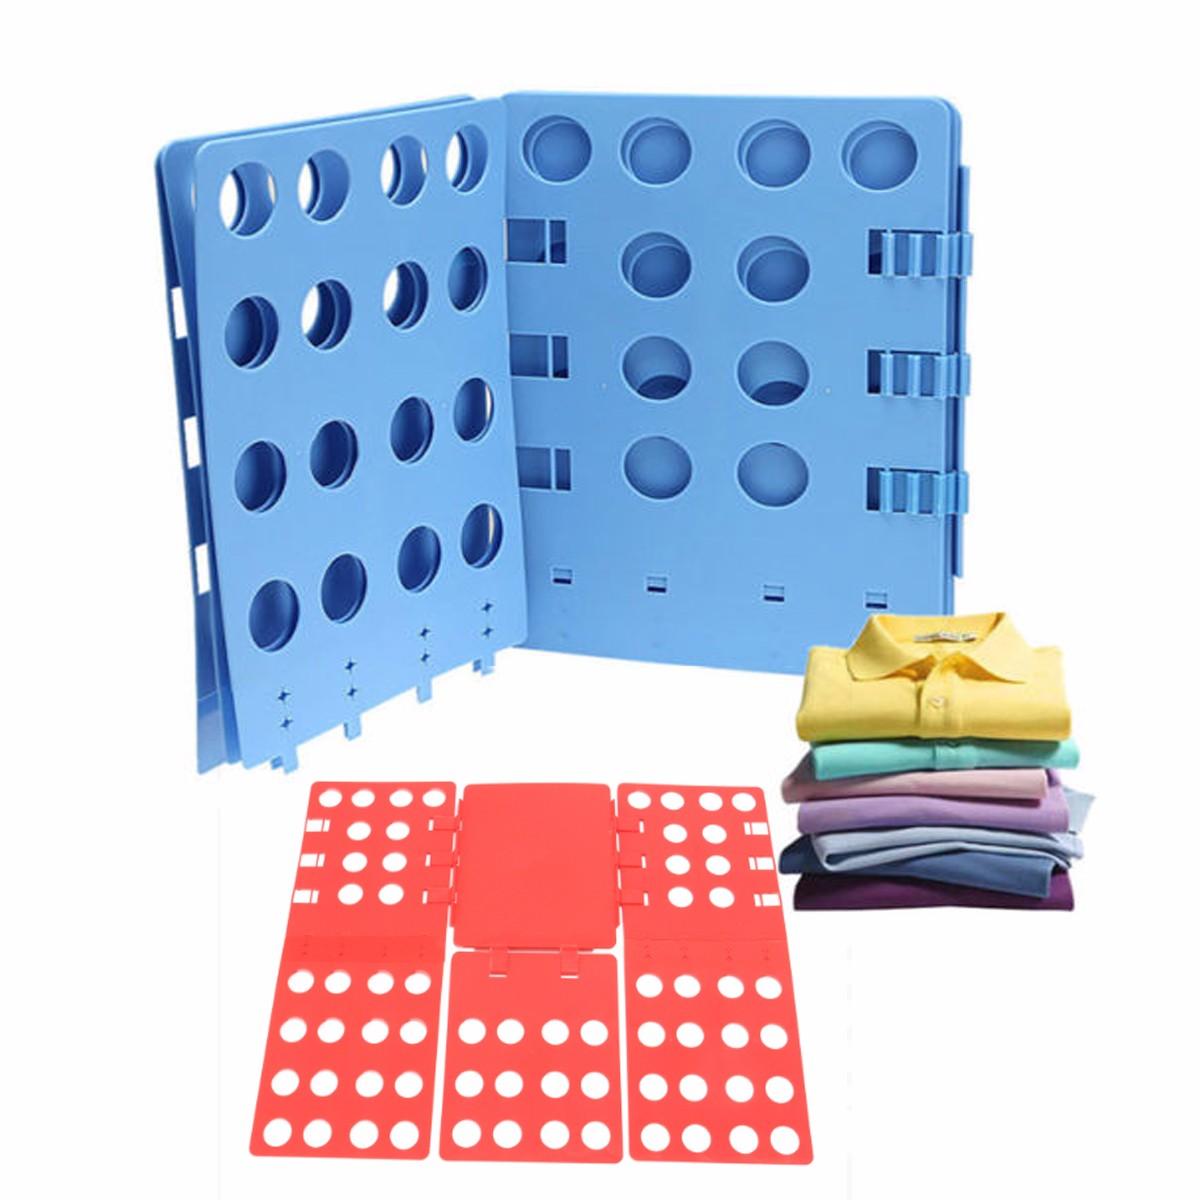 Elegant Clos Fer Adult Magic Fing Board Flip F Laundryorganizer Fer Board Clos Fer Adult Magic Fing Board Flip F Laundry Shirt Fing Board How To Use Shirt Fing Board Dimensions houzz-03 Shirt Folding Board